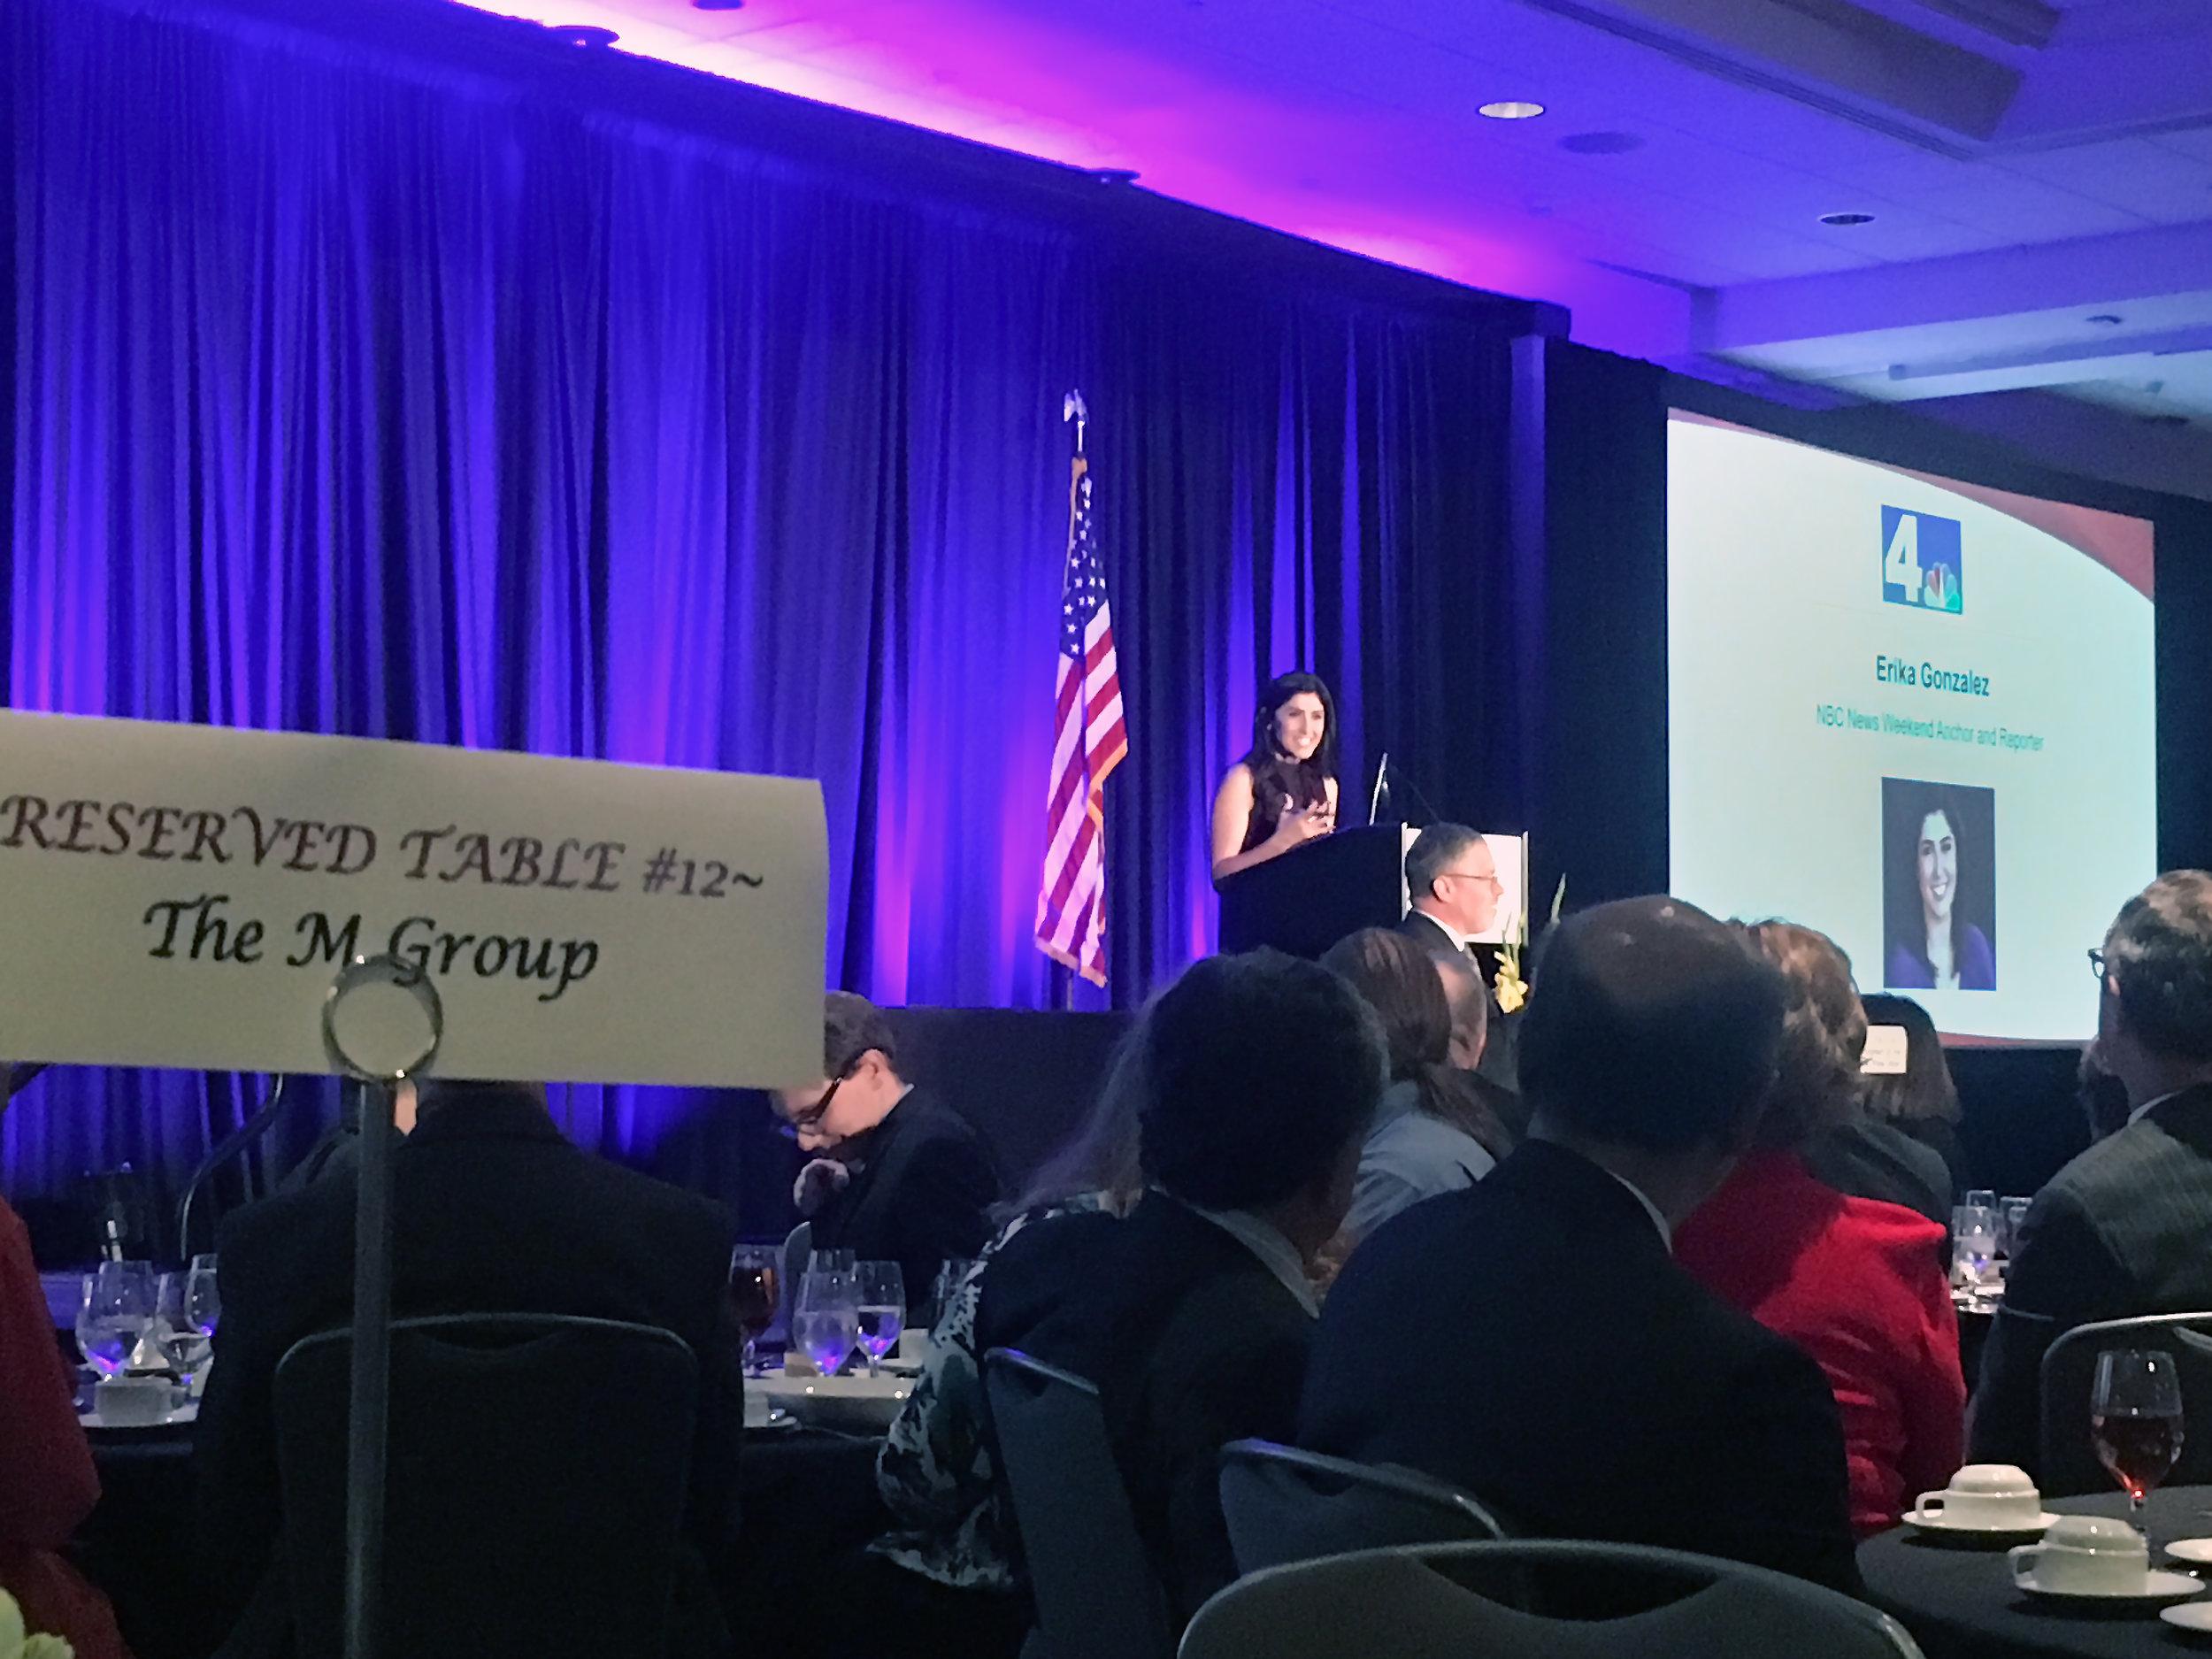 FOTO ServiceSource Awards Dinner 2018-10-18 110_edit.jpg